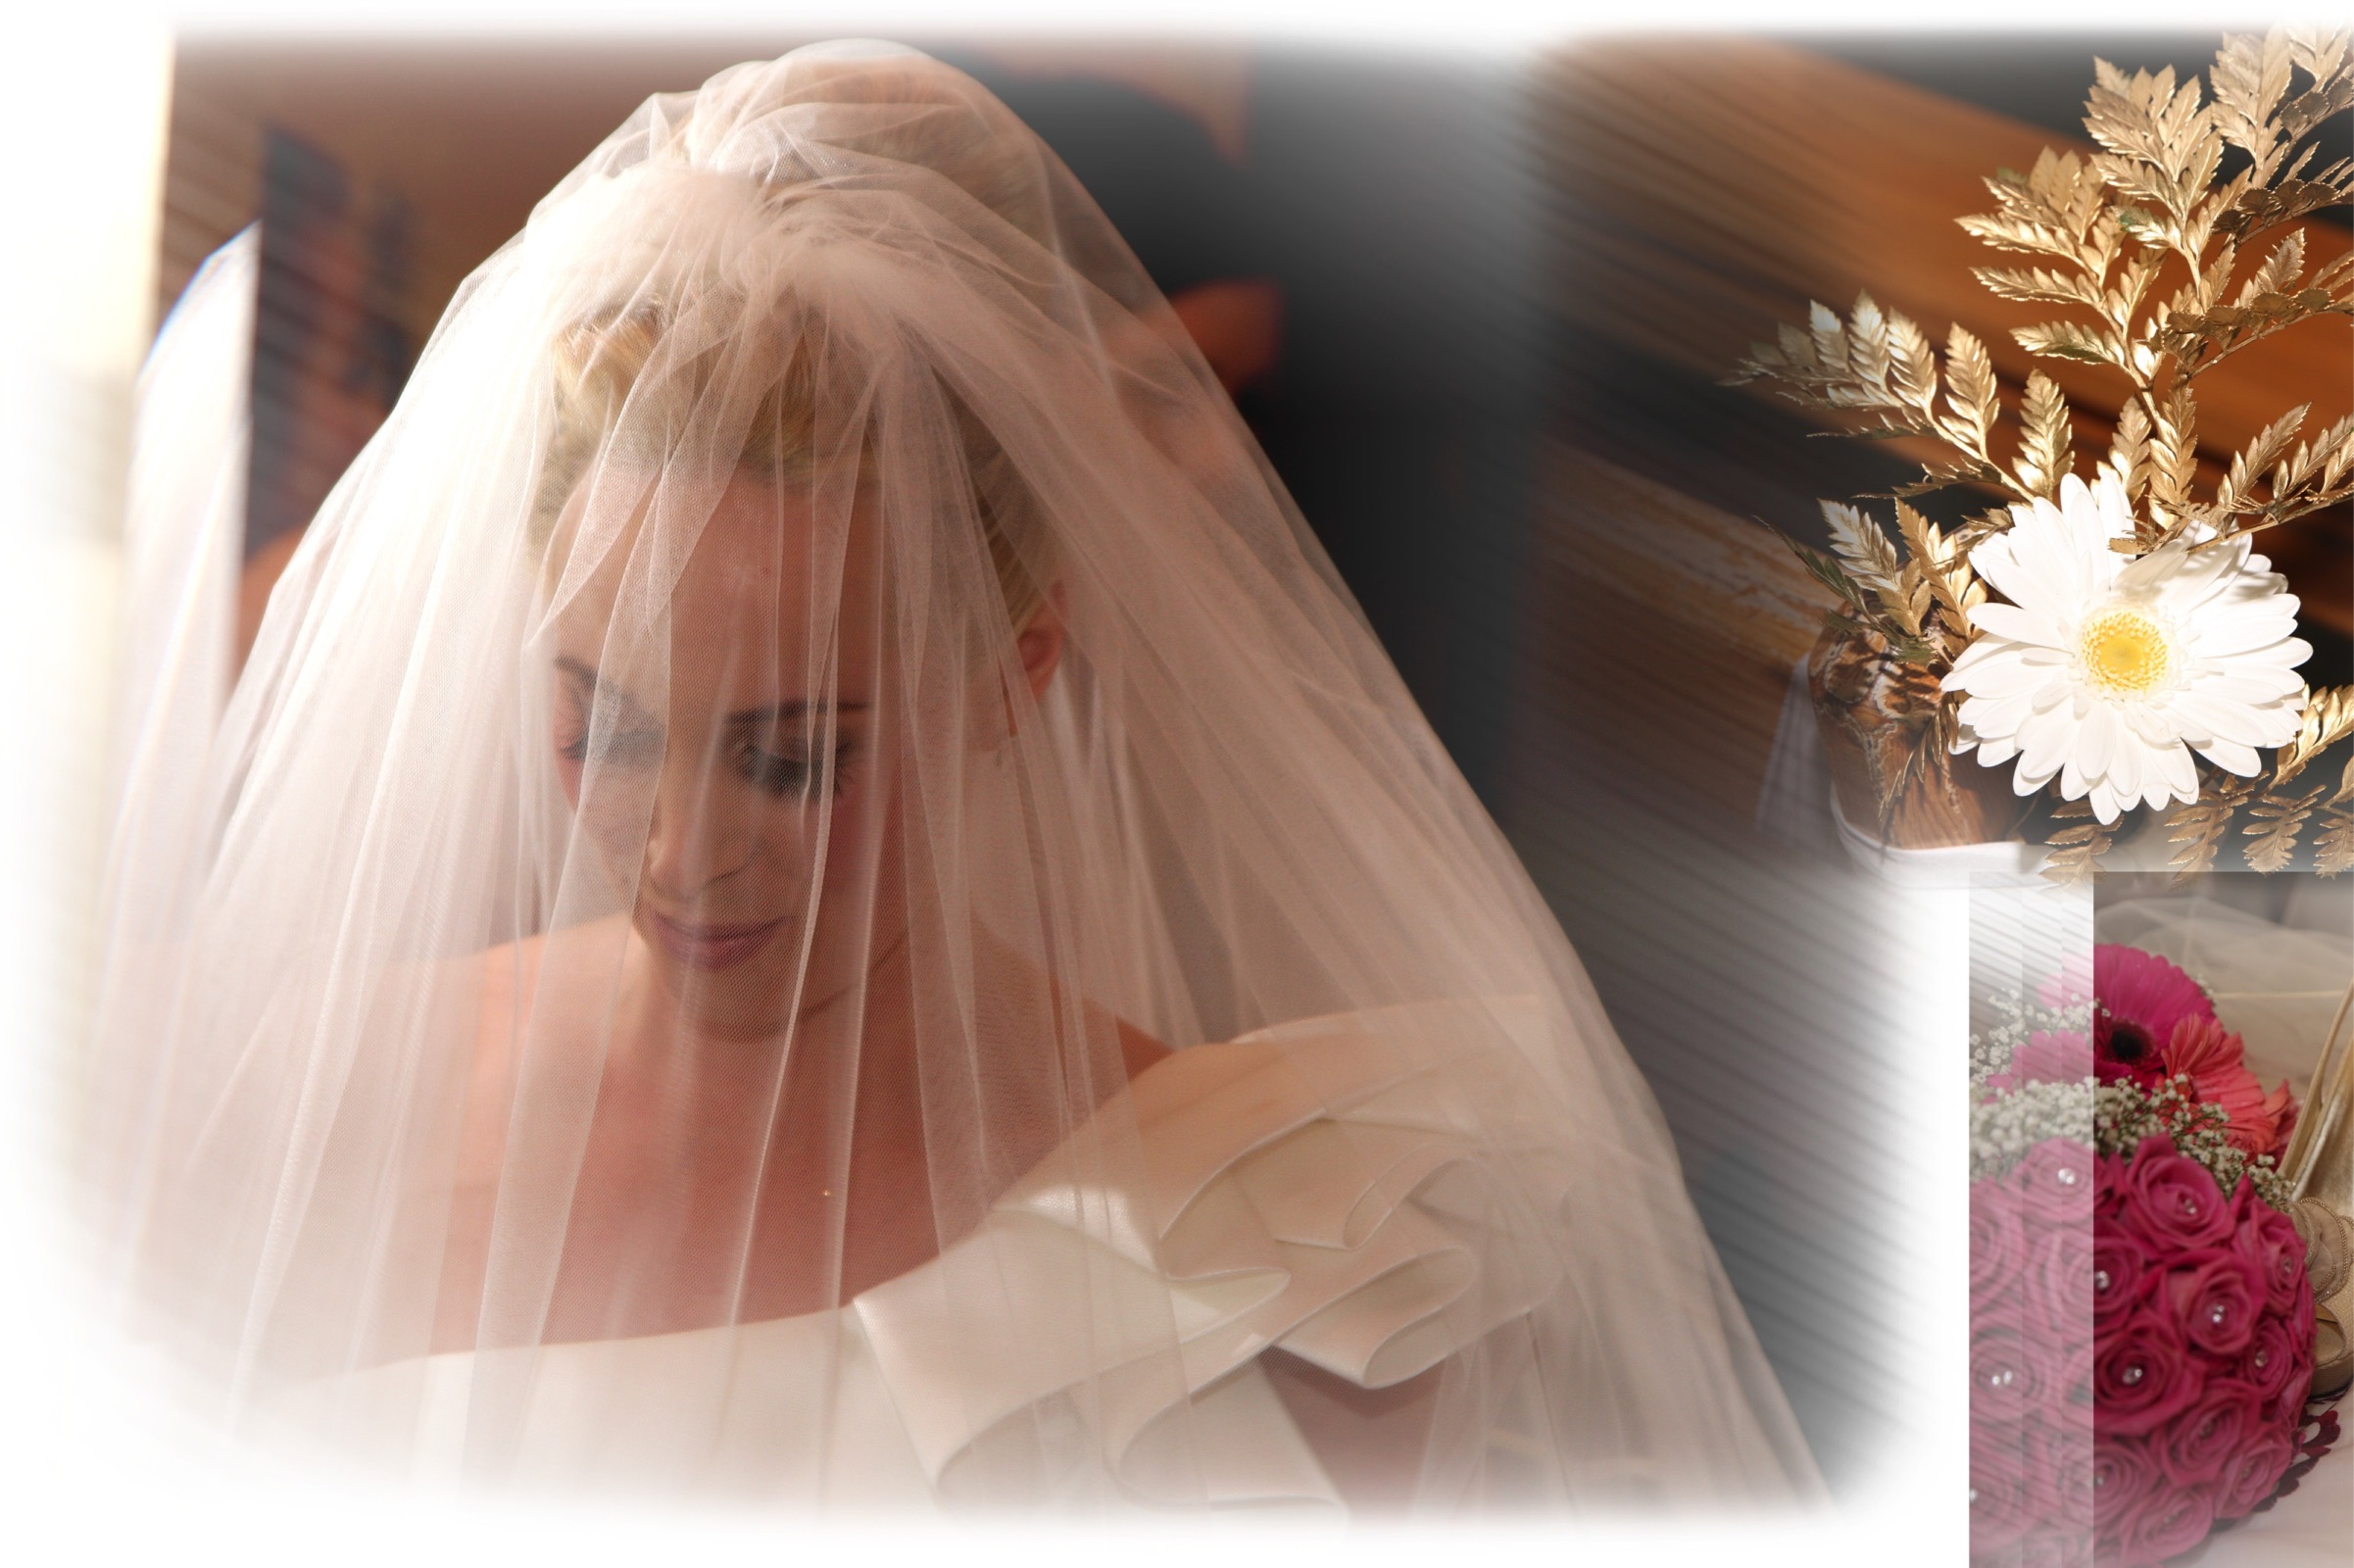 Aine & Kieran wedding album